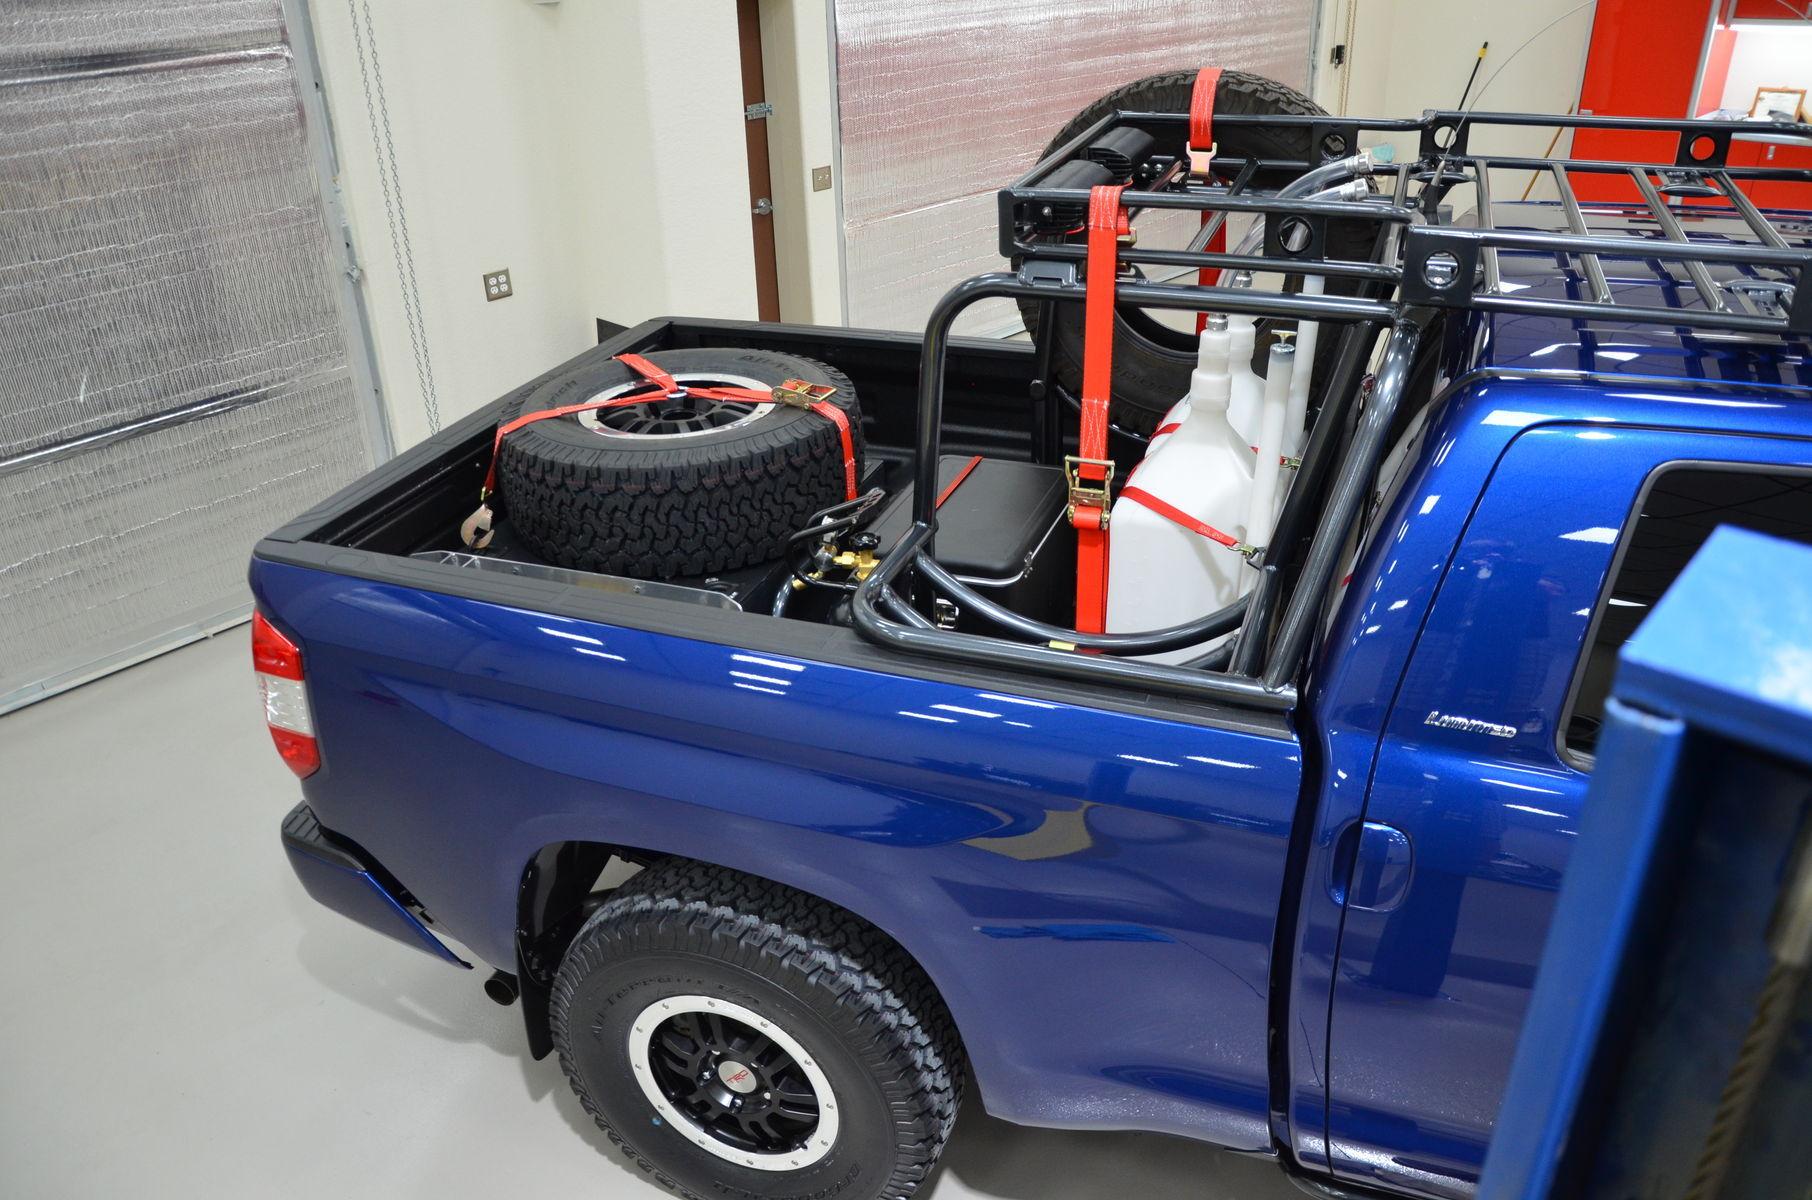 2014 Toyota Tundra | N-FAB TRD PRO Build - Toyota Tundra In The Garage